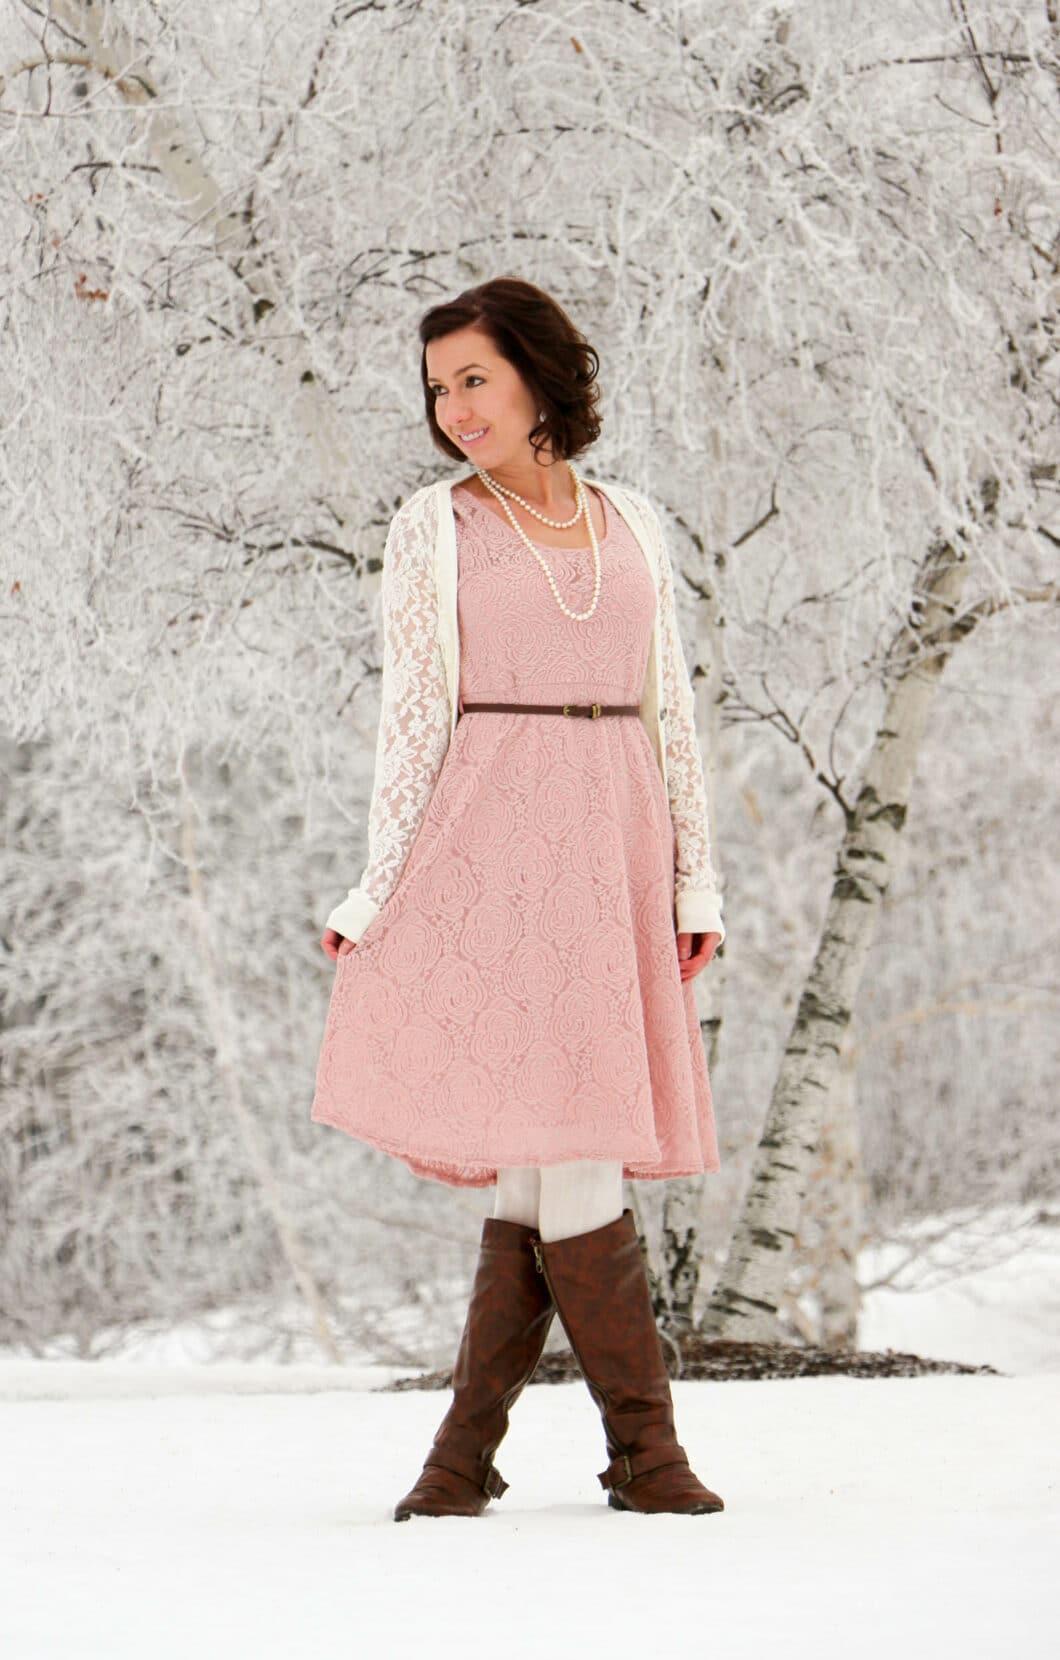 Styling a PinkBlush Dress for a Winter Wonderland